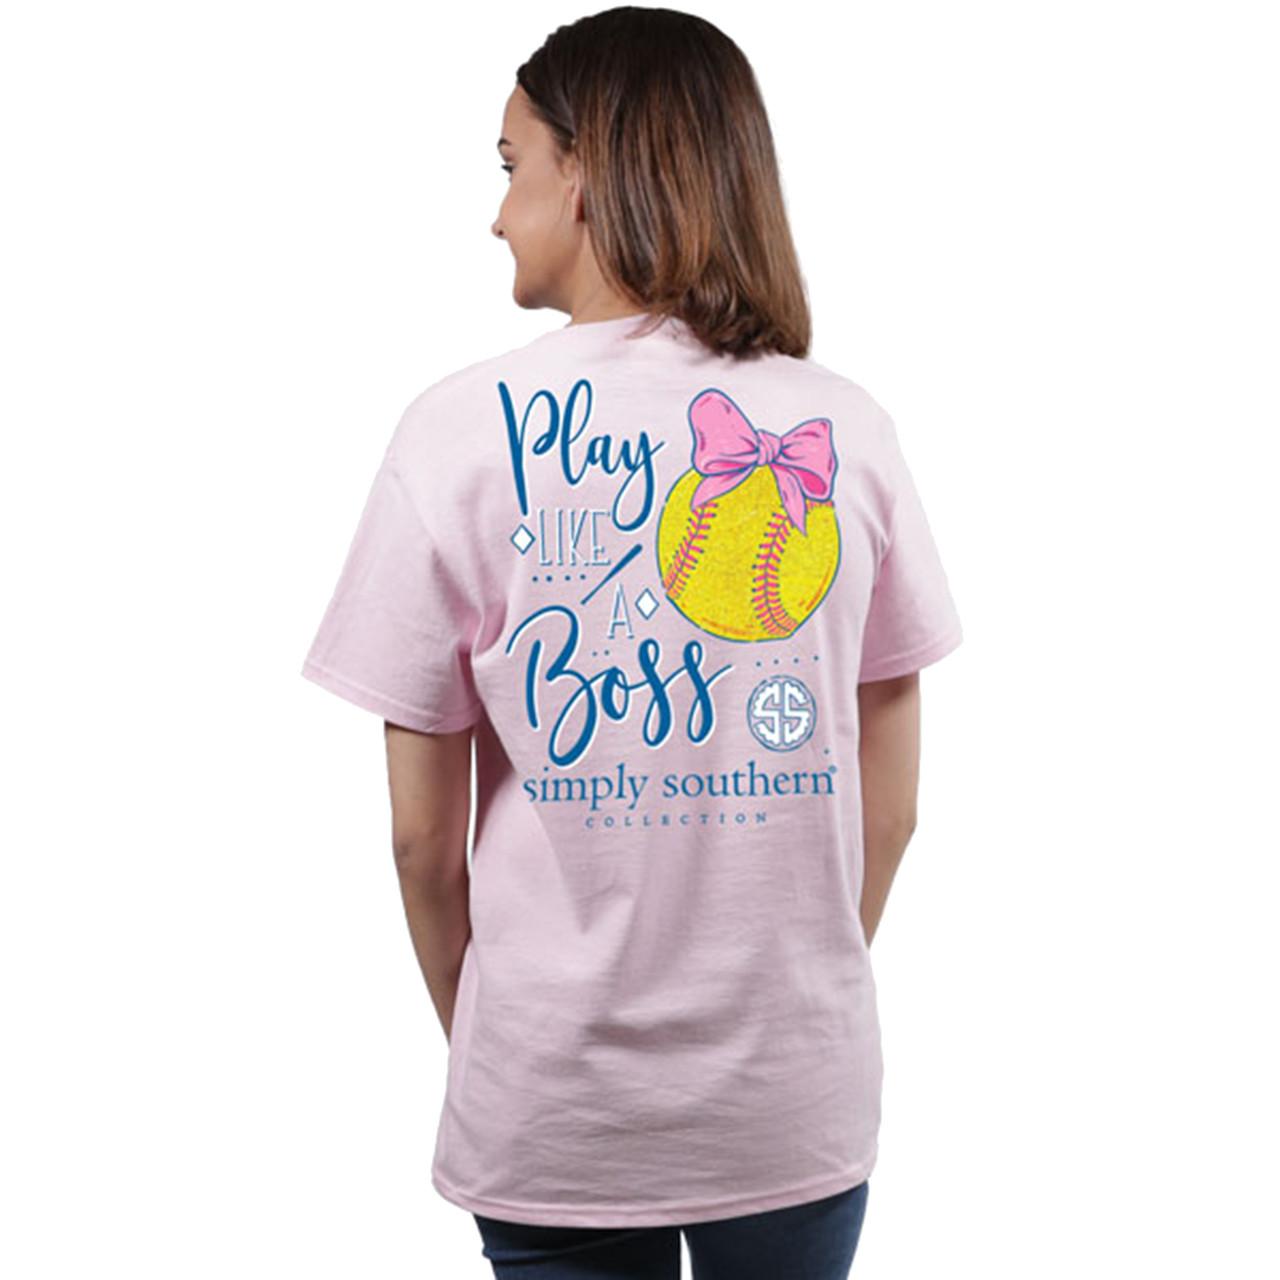 cf04223437afe5 Simply Southern Youth Preppy Softball Like a Boss Short Sleeve - Trenz  Shirt Company